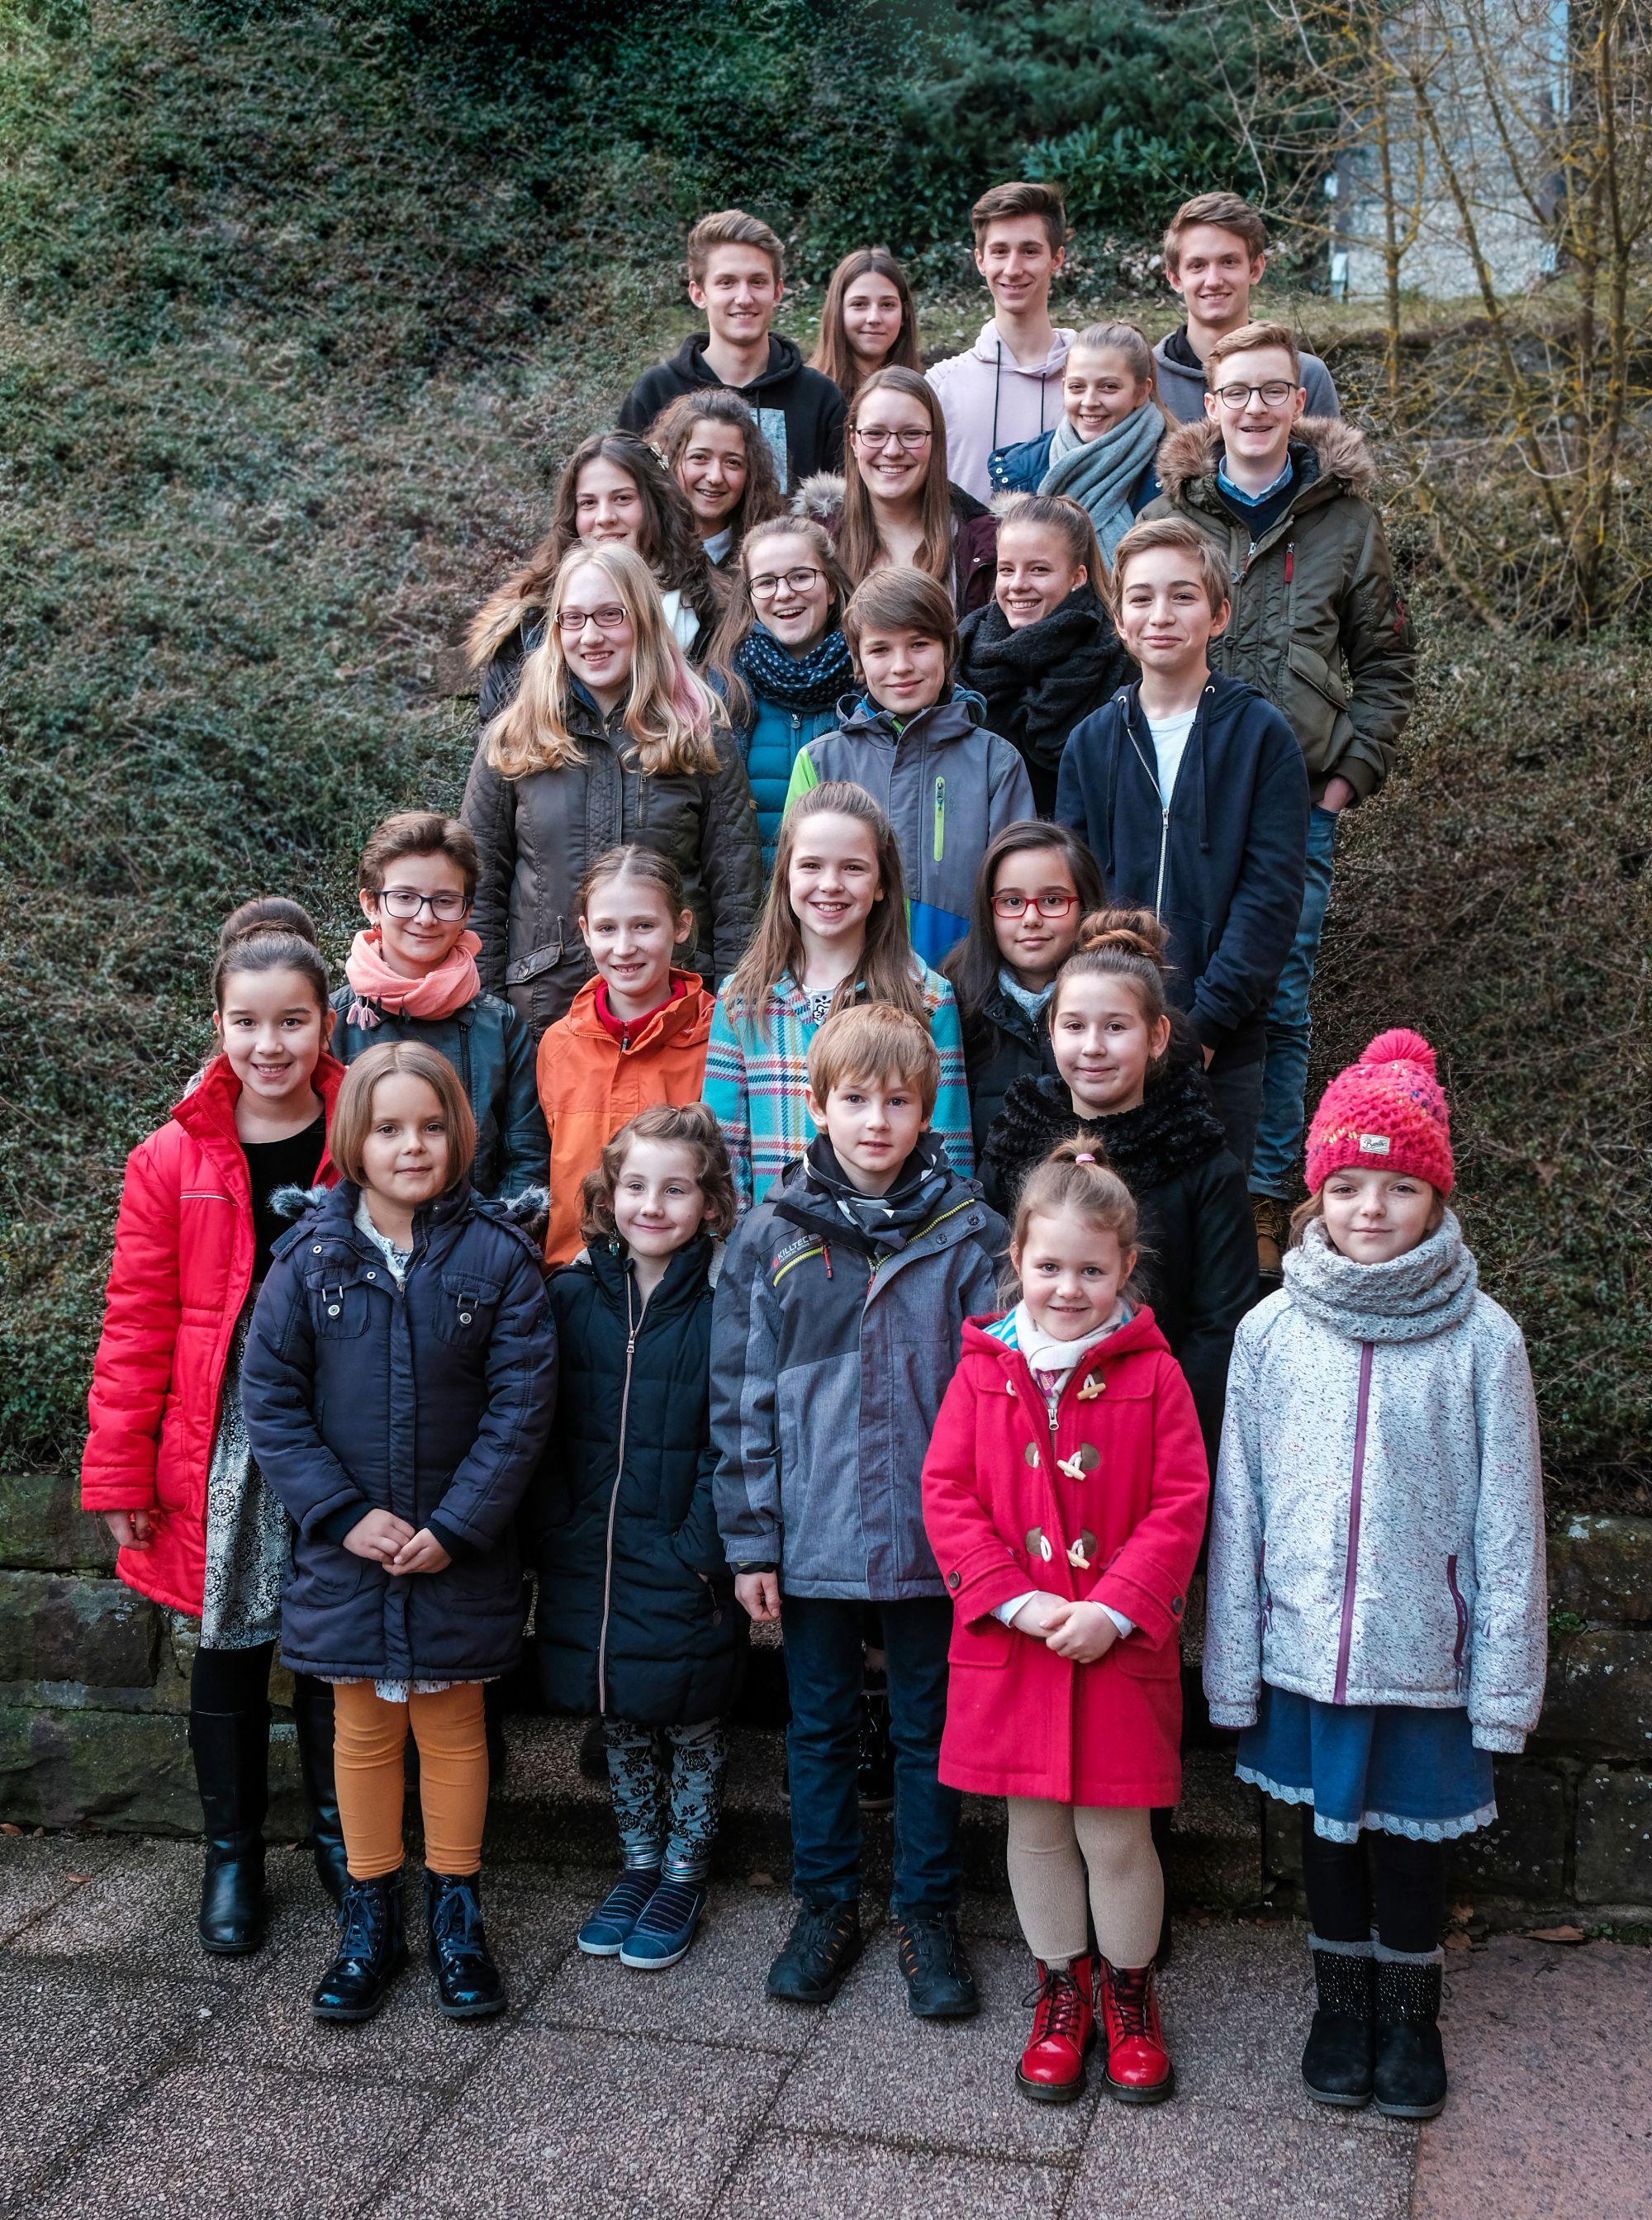 Preisträger Jugend musiziert 2018 in Freudenstadt